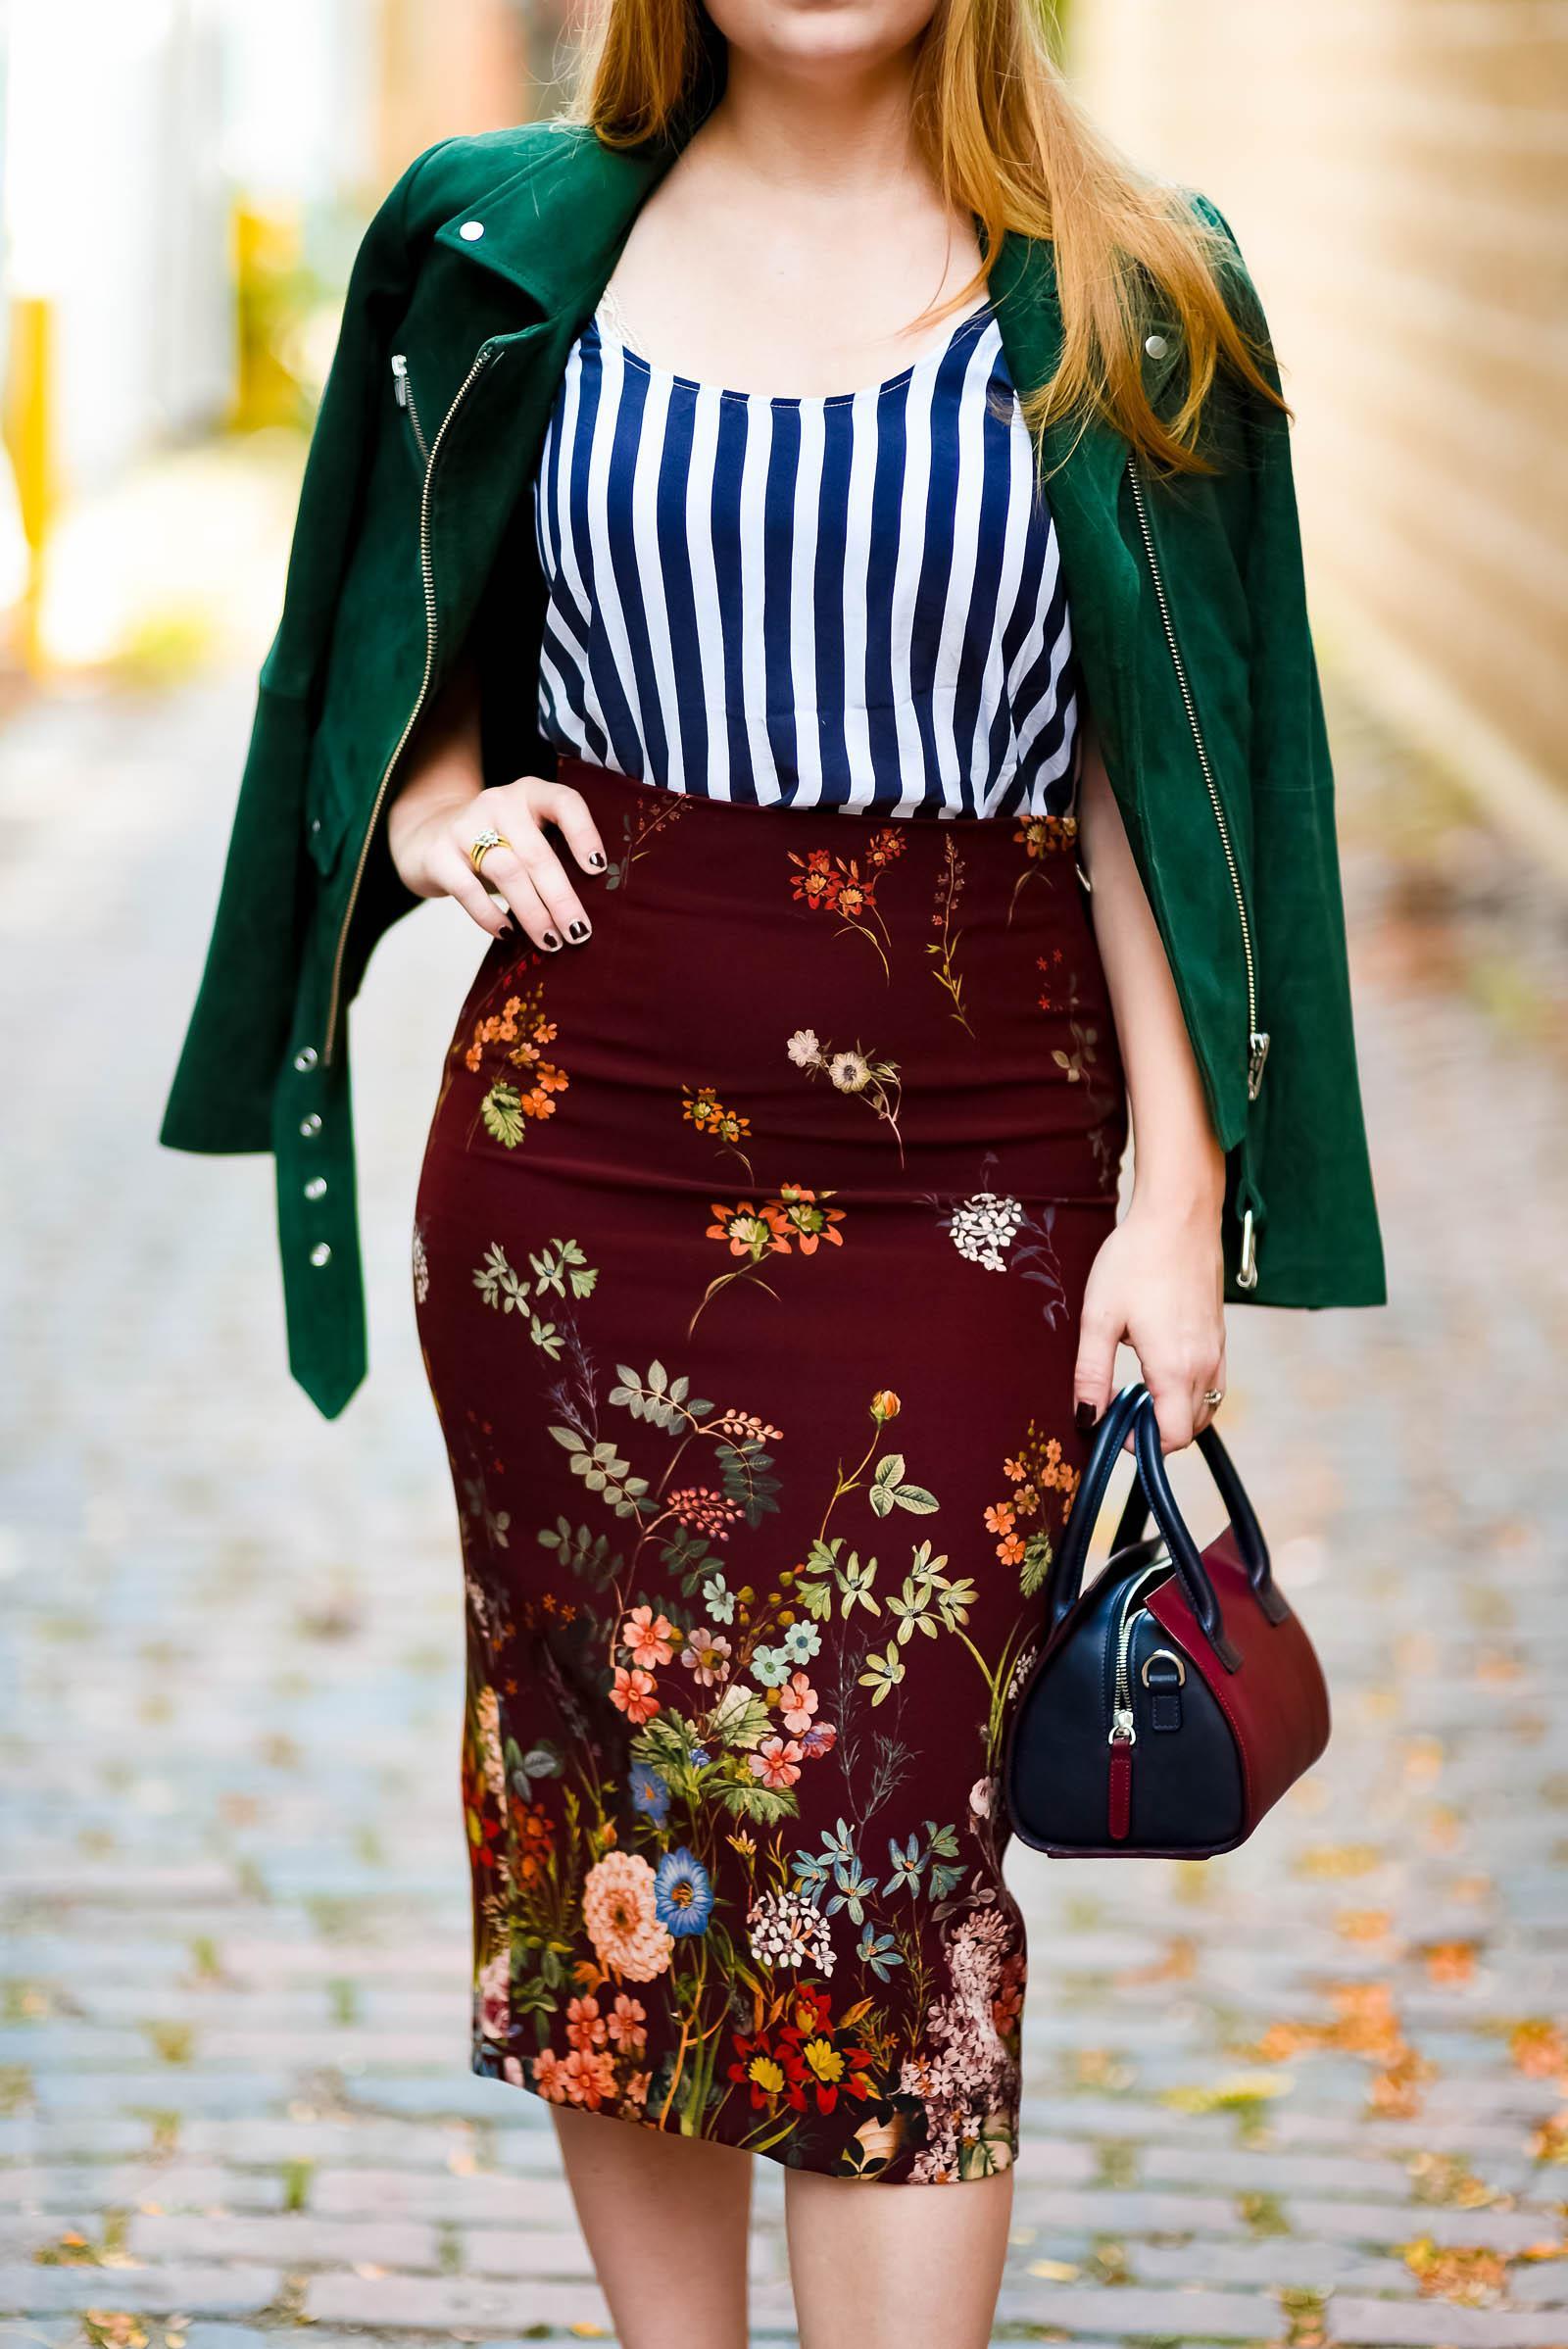 Moto Floral Stripe Autumn Outfit